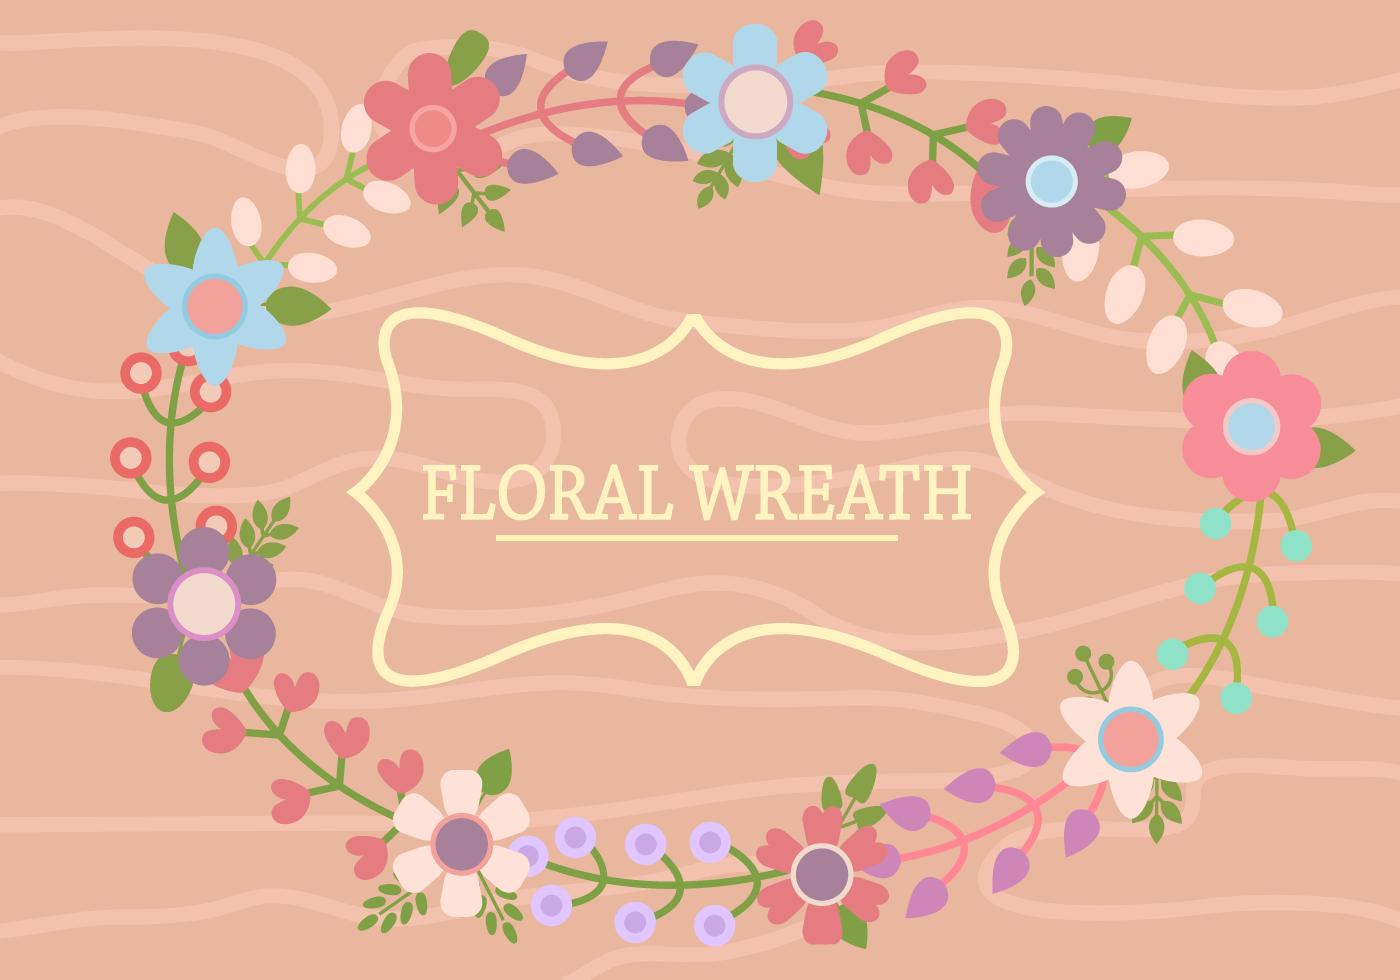 Free Flower Wreath Vektor - Kostenlose Vektor-Kunst, Archiv-Grafiken ...